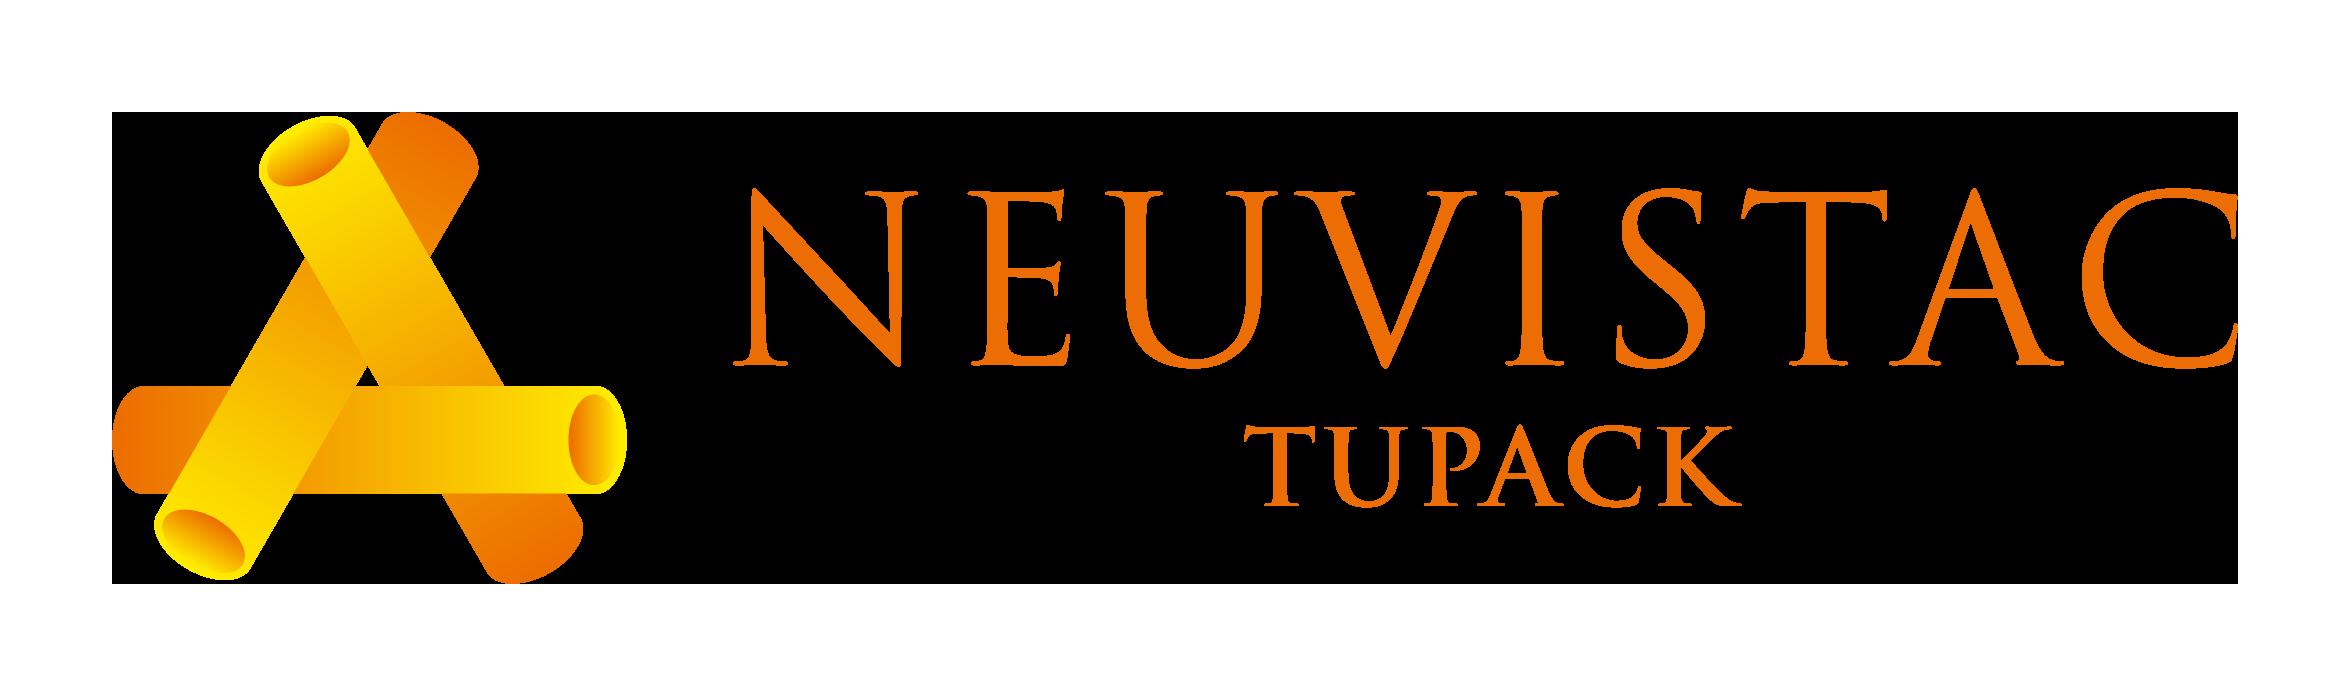 Neuvistac